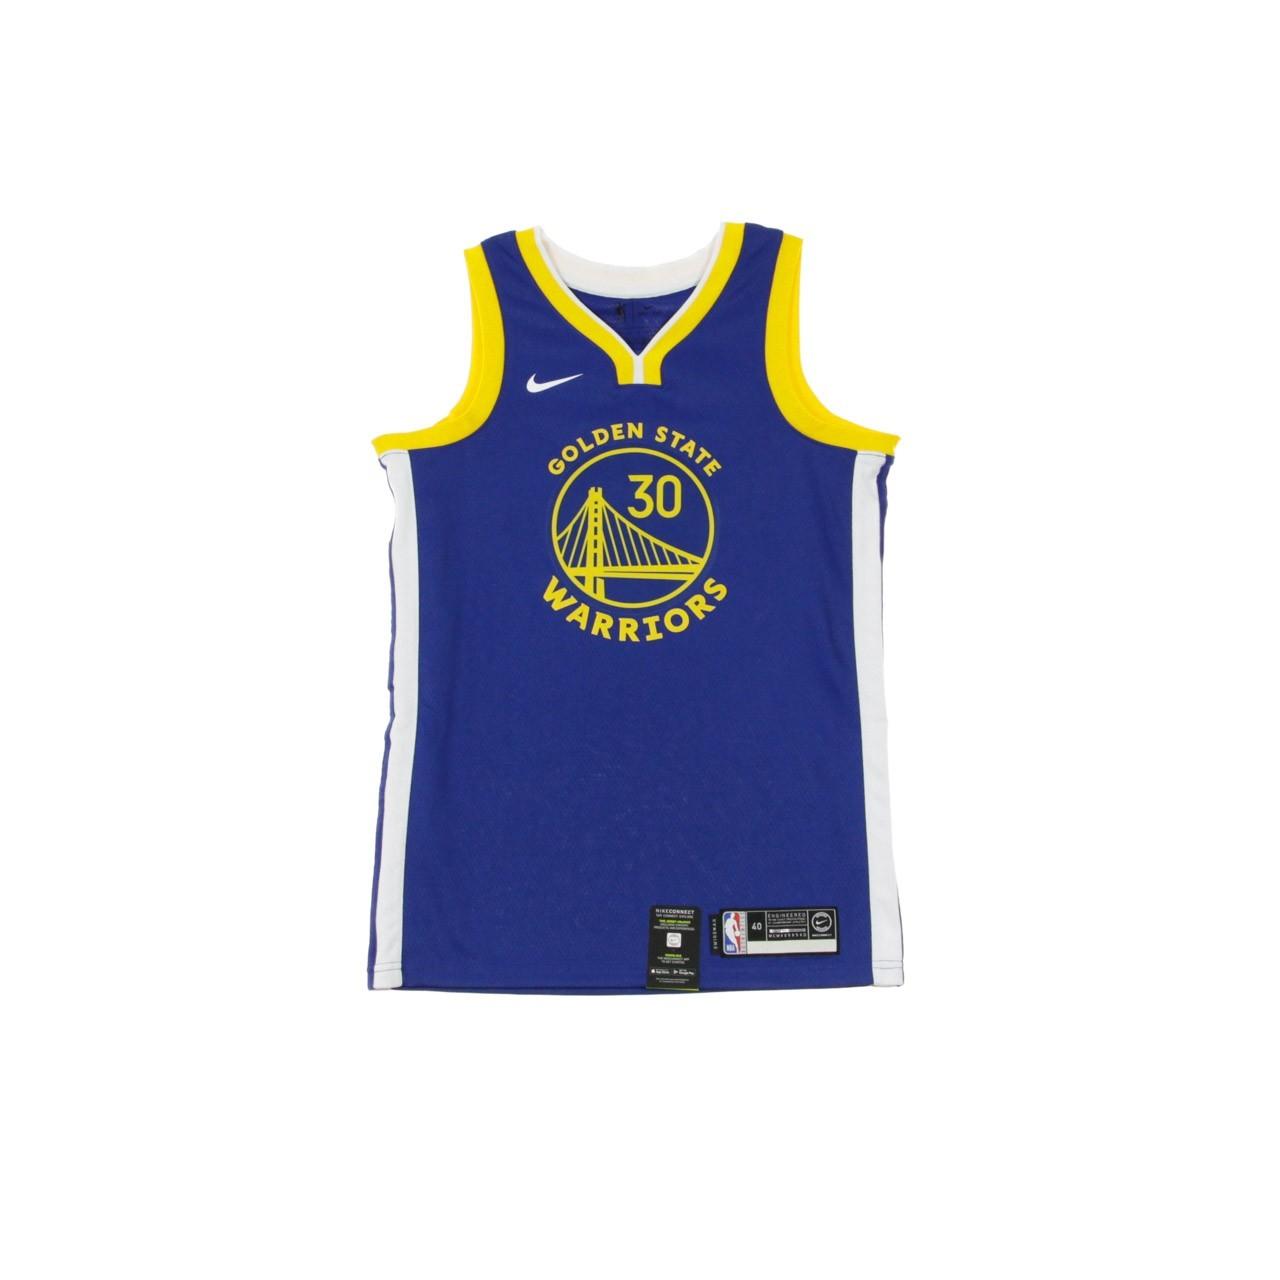 NIKE NBA NBA SWINGMAN JERSEY ICON EDITION NO 30 STEPHEN CURRY GOLWAR ROAD AV4947-496